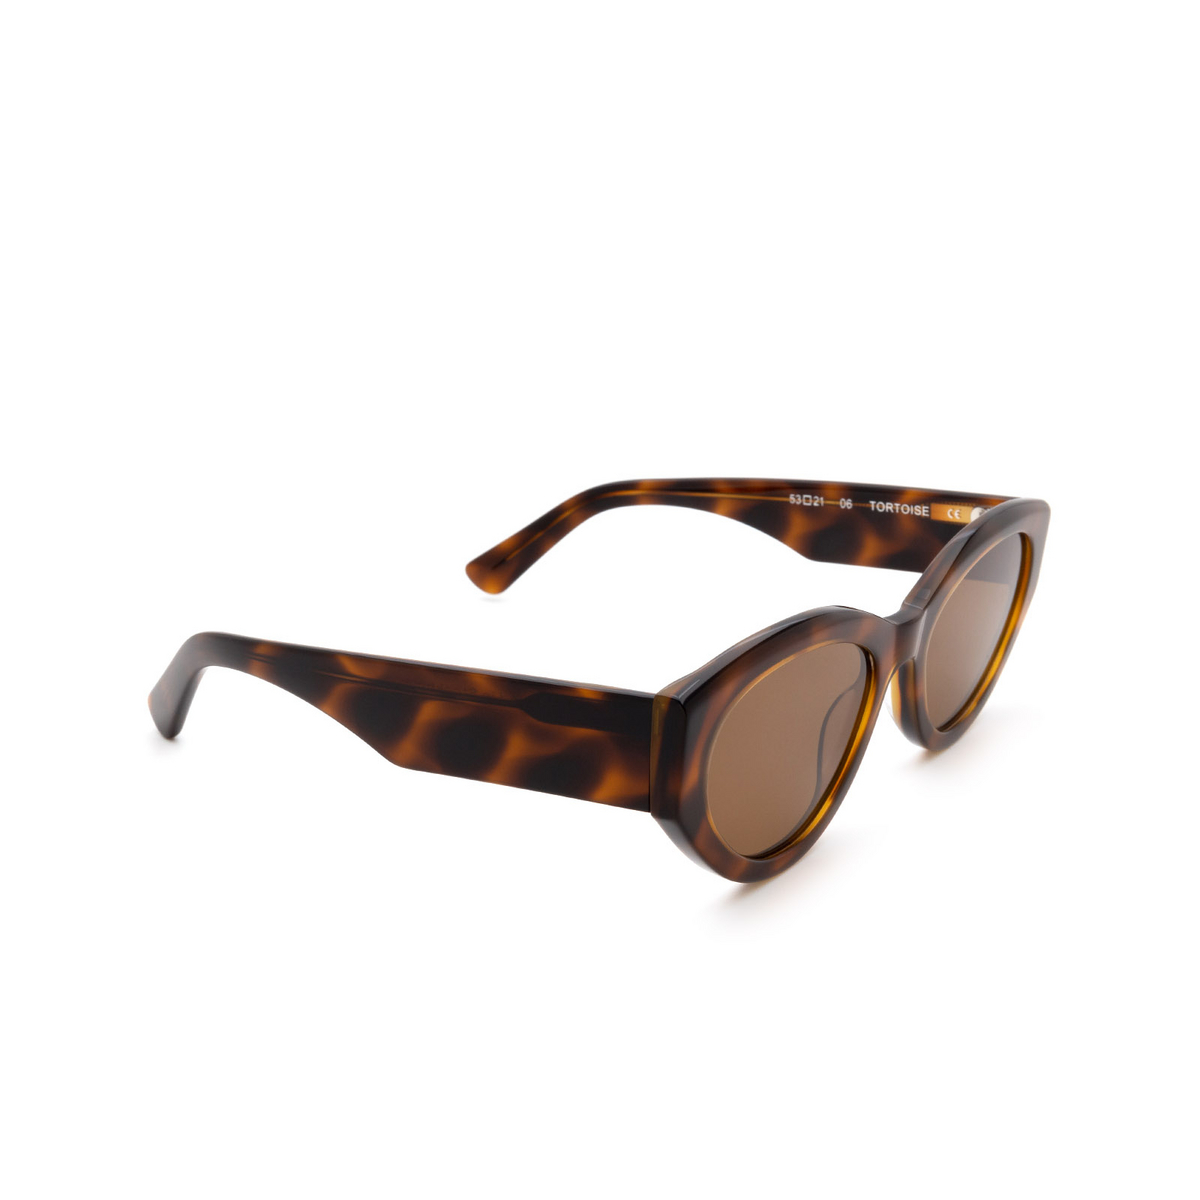 Chimi® Cat-eye Sunglasses: 06 color Tortoise - three-quarters view.